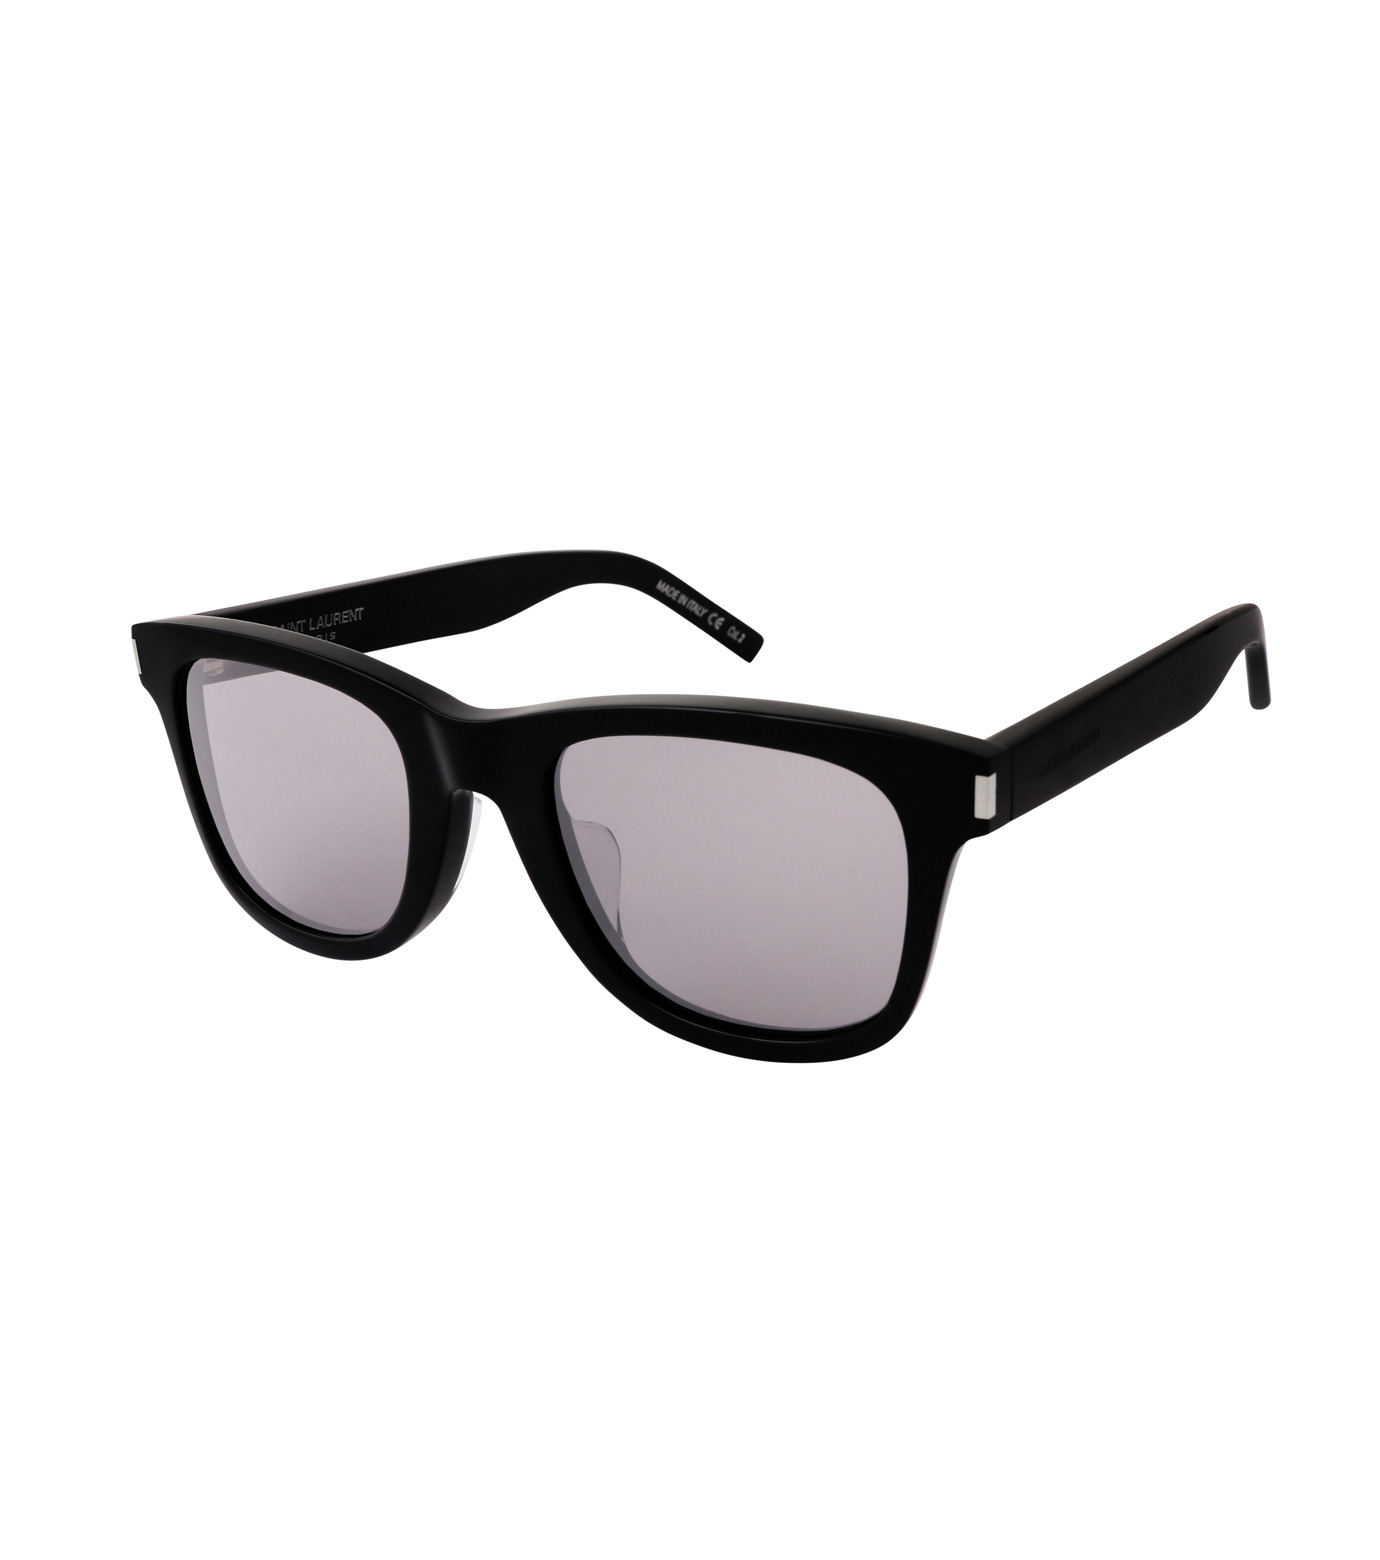 SAINT LAURENT(サンローラン)のSL 51 Square Flame-BLACK(アイウェア/eyewear)-419700-13 拡大詳細画像1